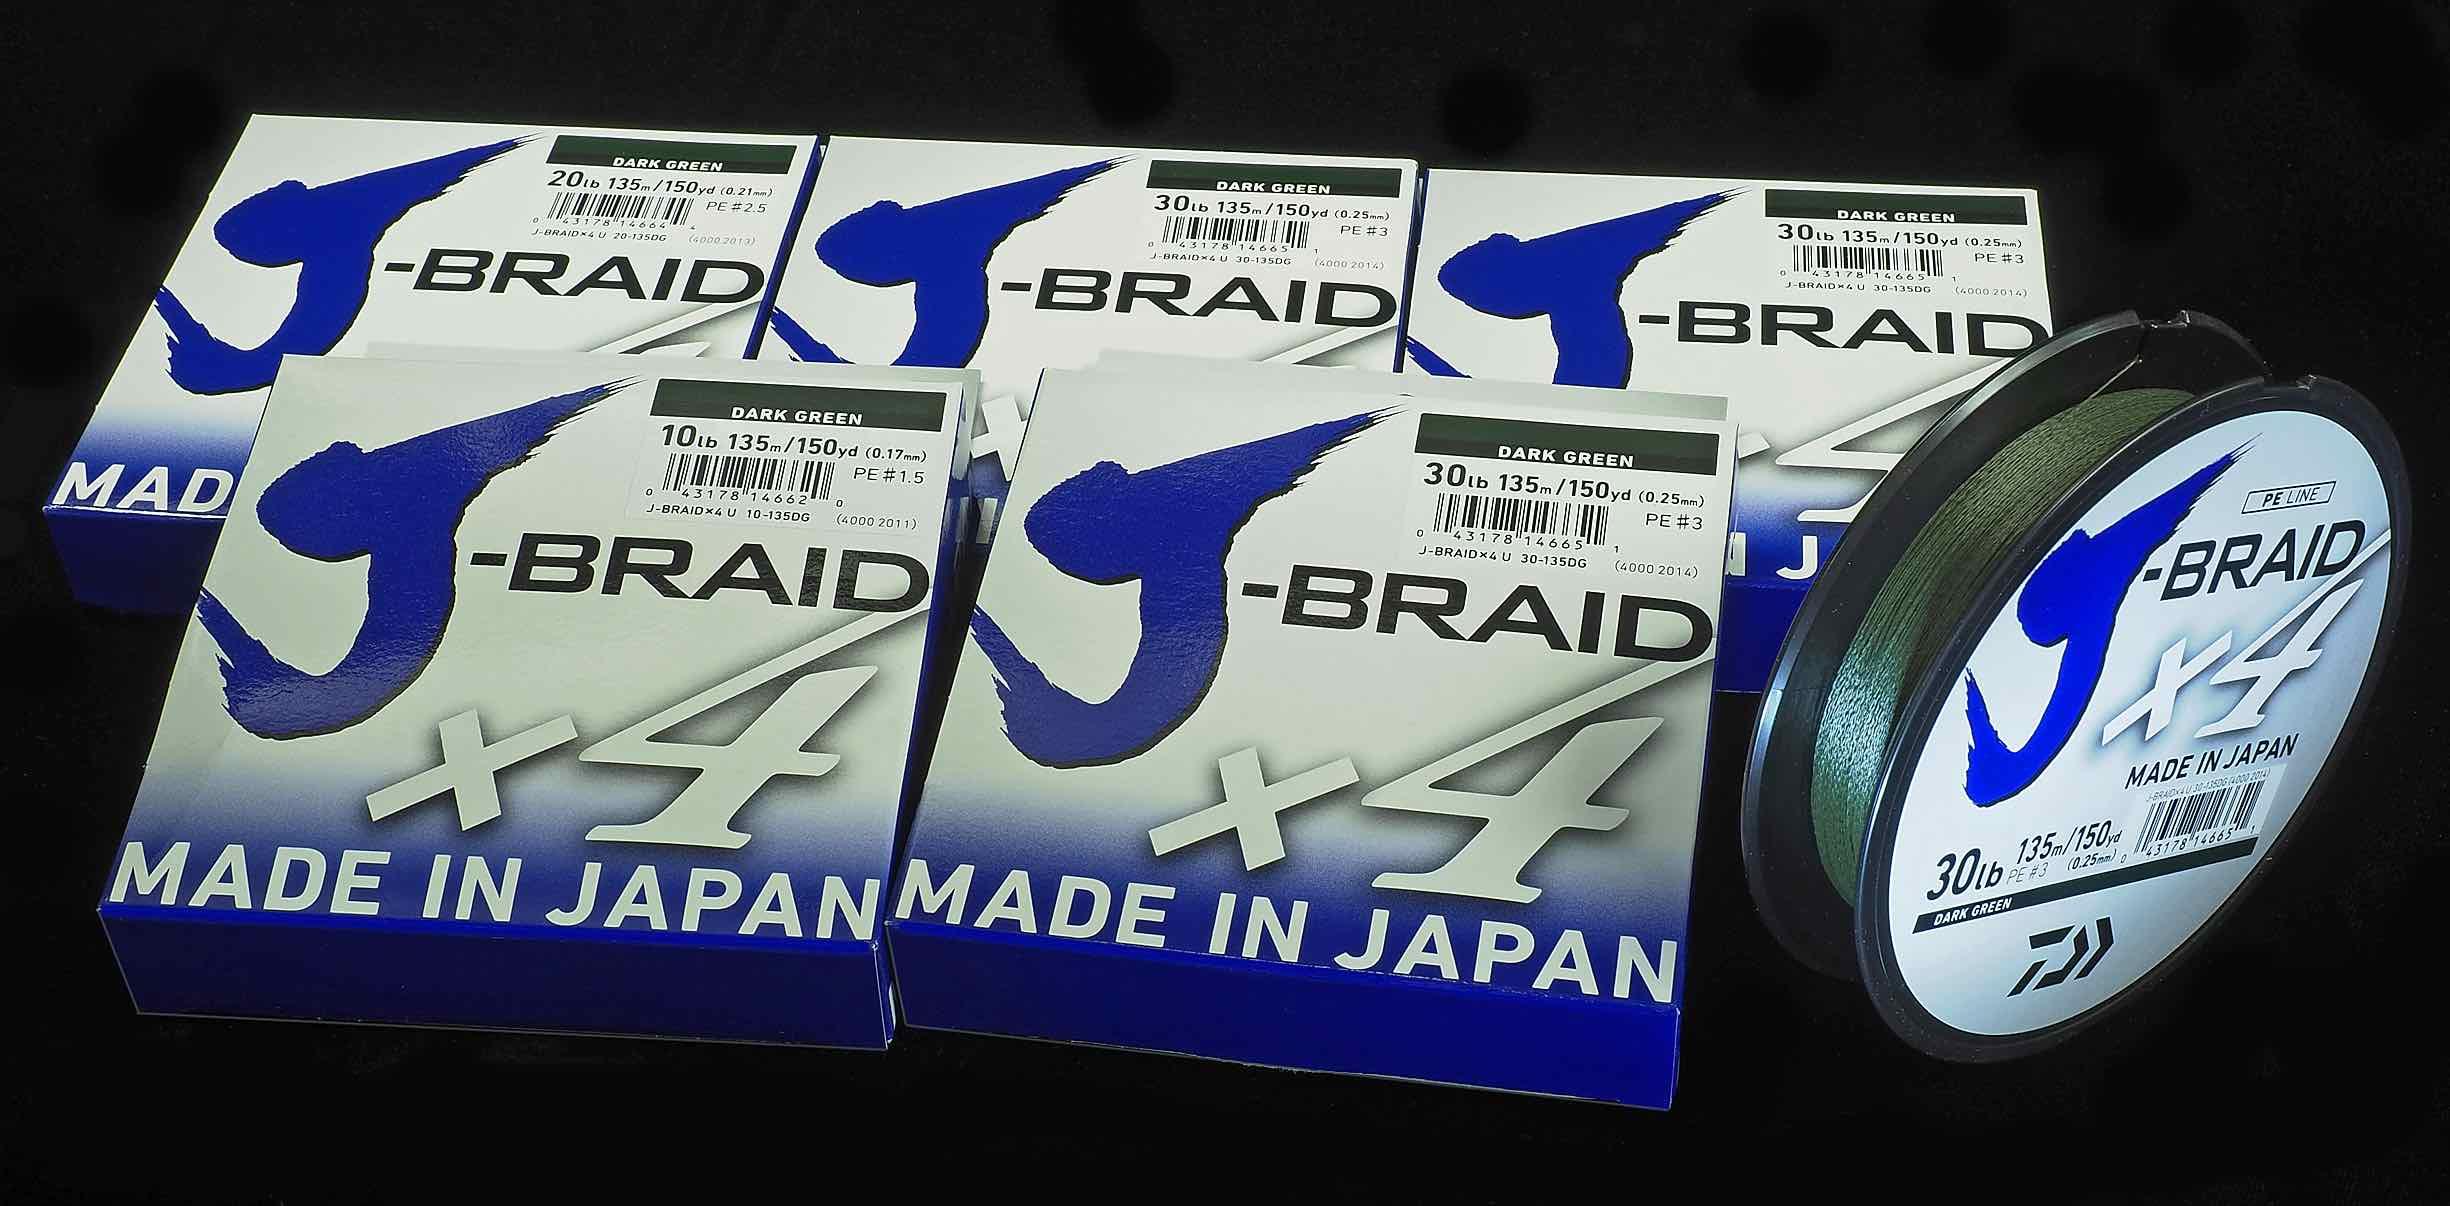 Daiwa J-Braid Braided Line 4X